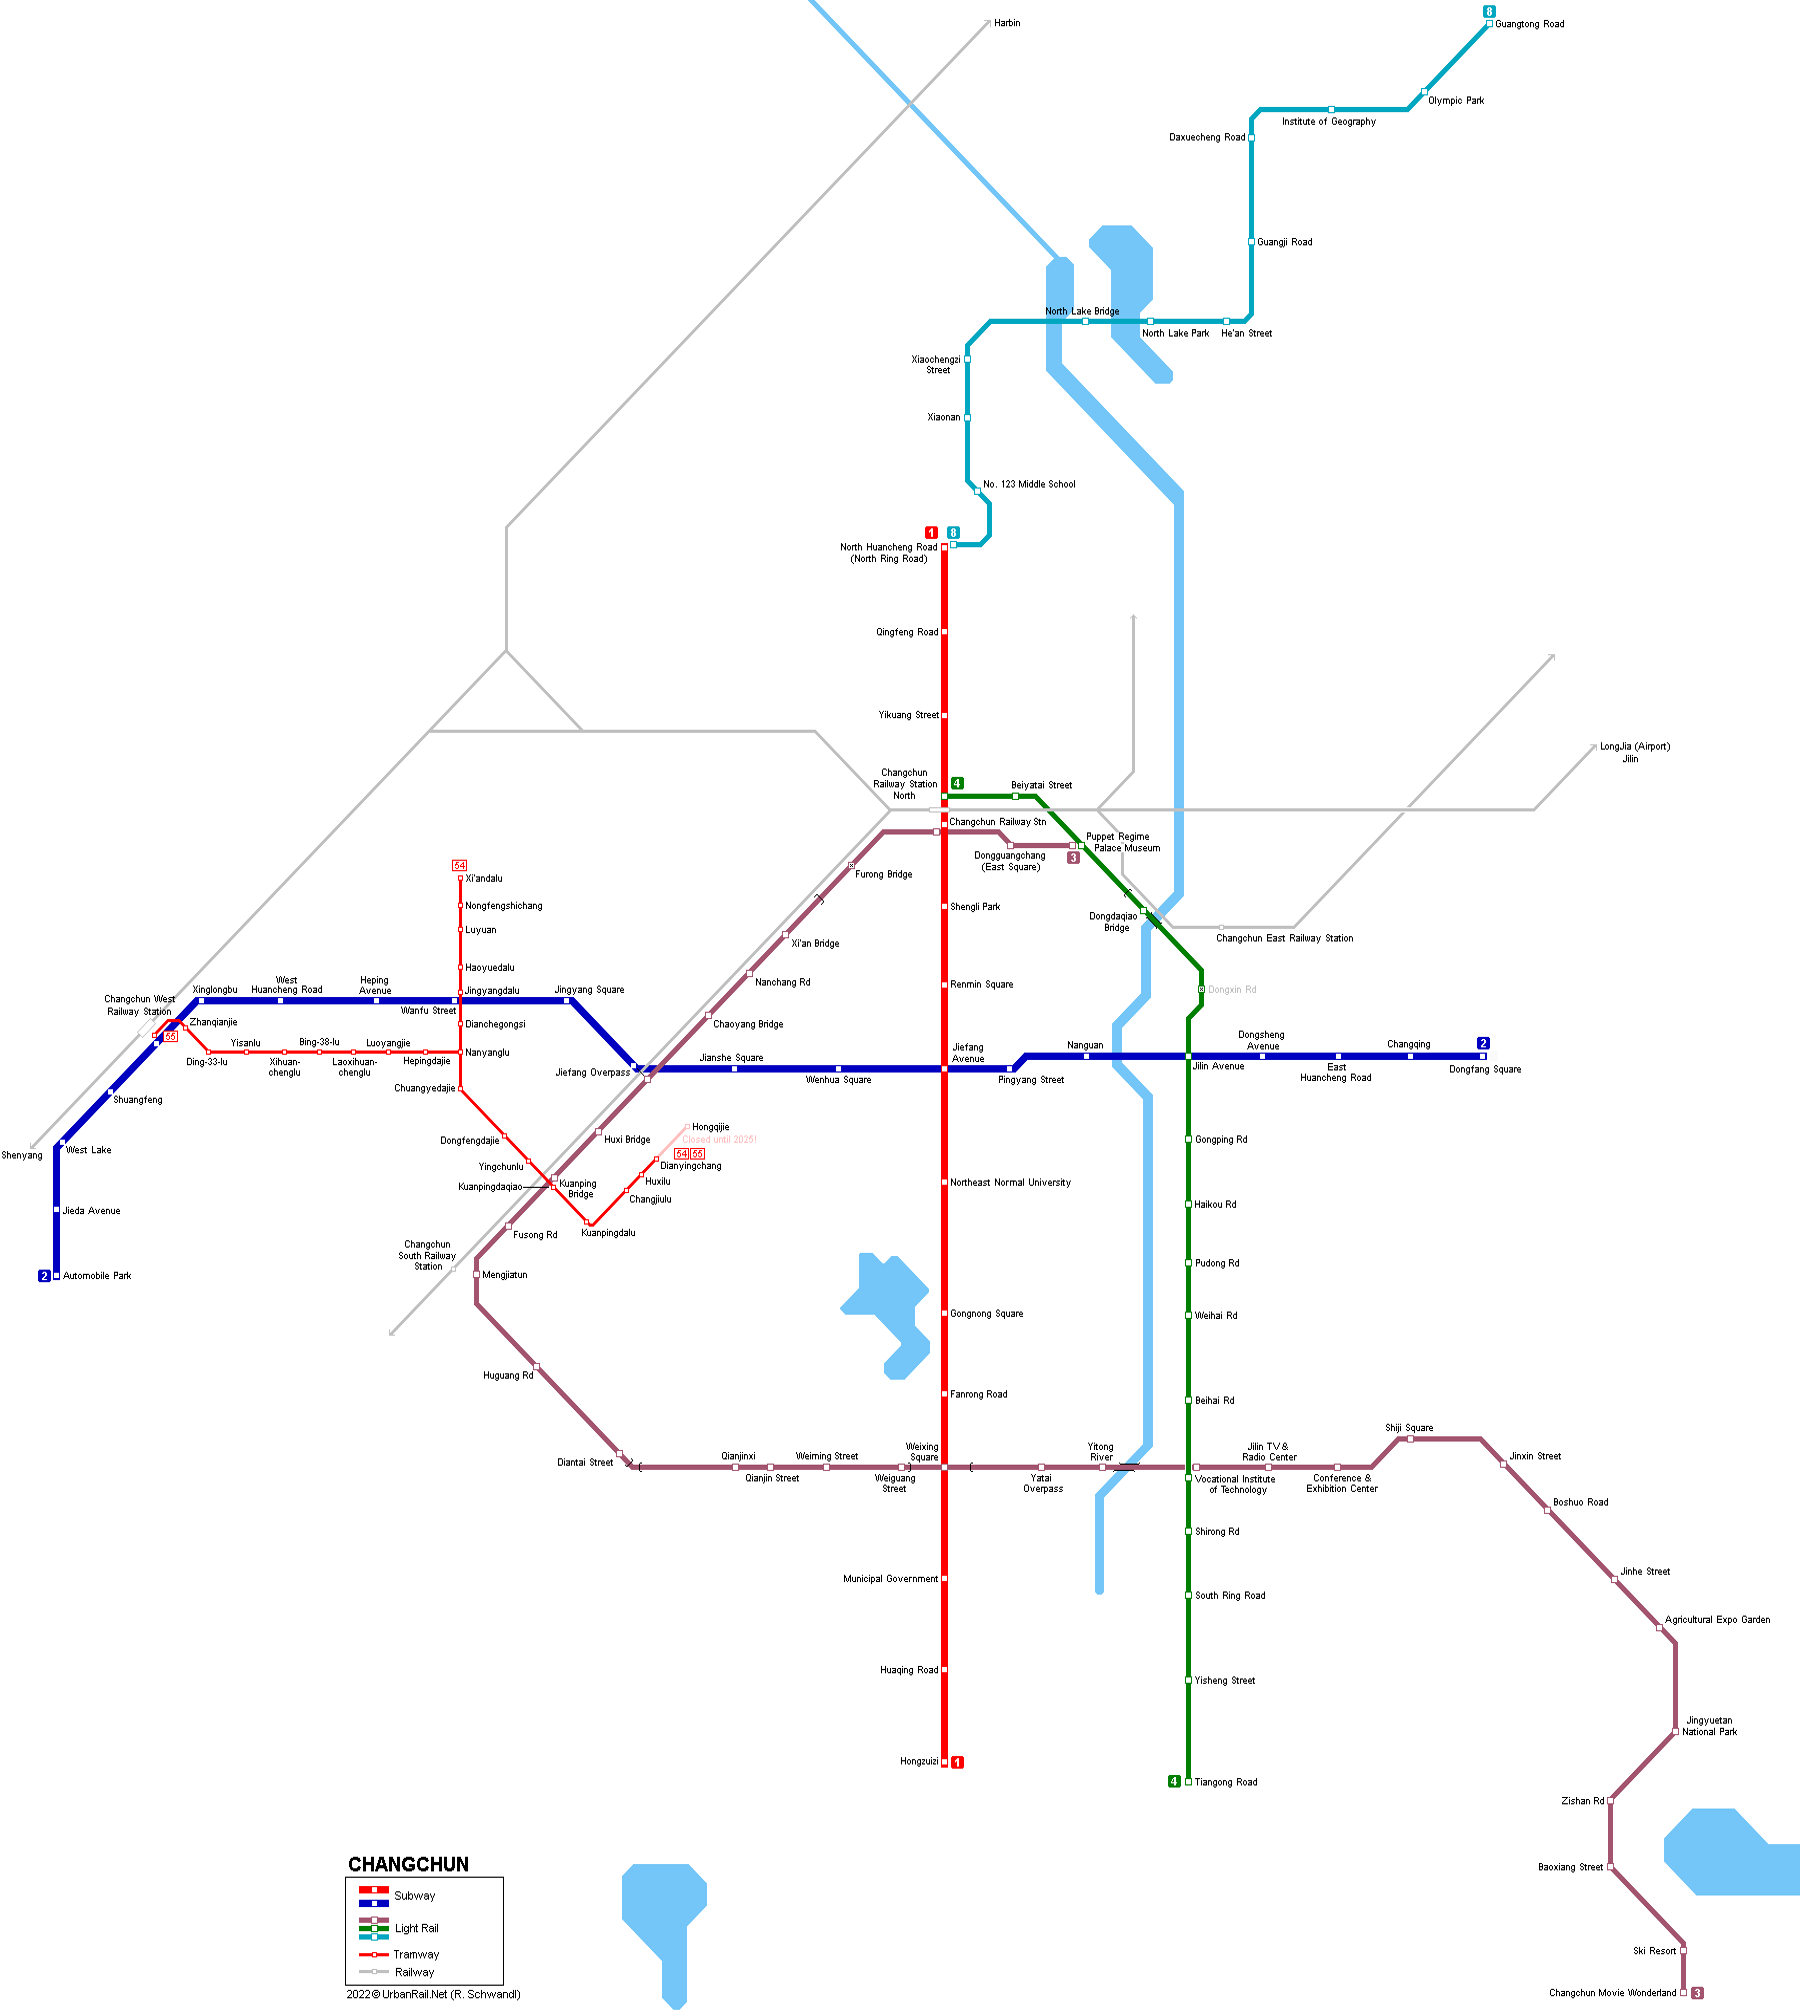 Beijing Subway Map 2018 Pdf.Urbanrail Net Asia China Changchun Metro